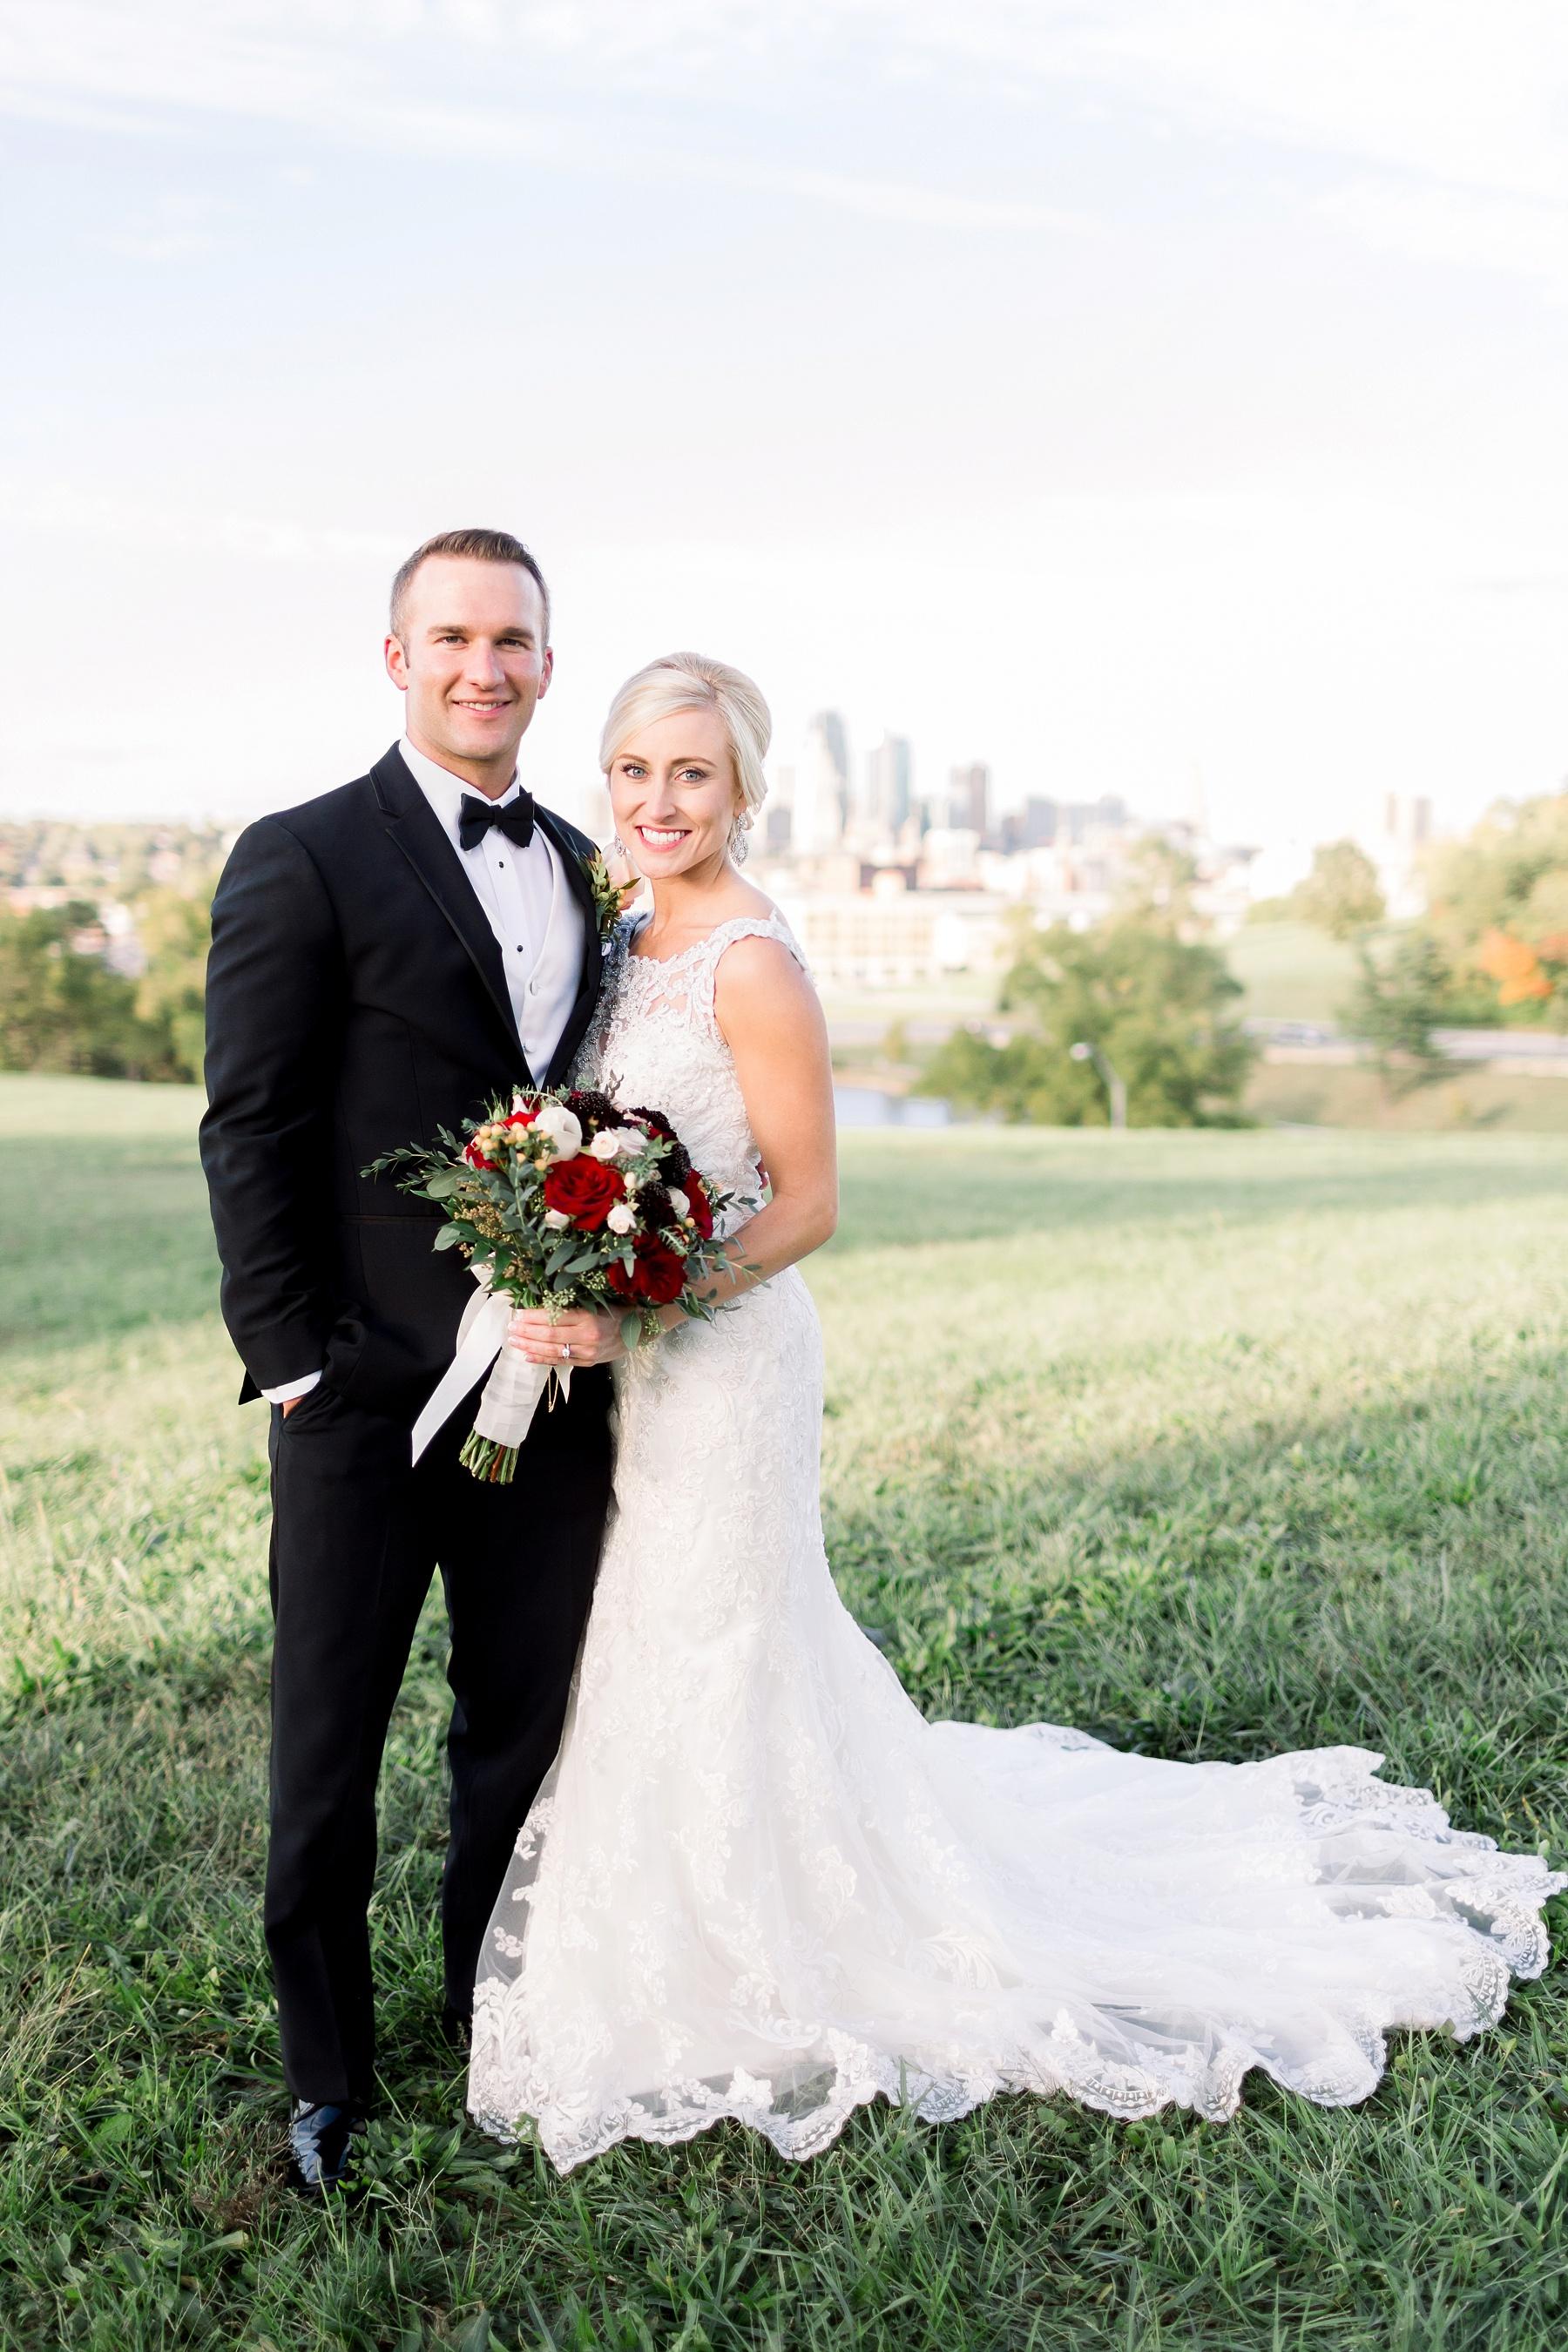 midwest-adventurous-wedding-photographer-elizabeth-ladean-photography-photo_4788.jpg